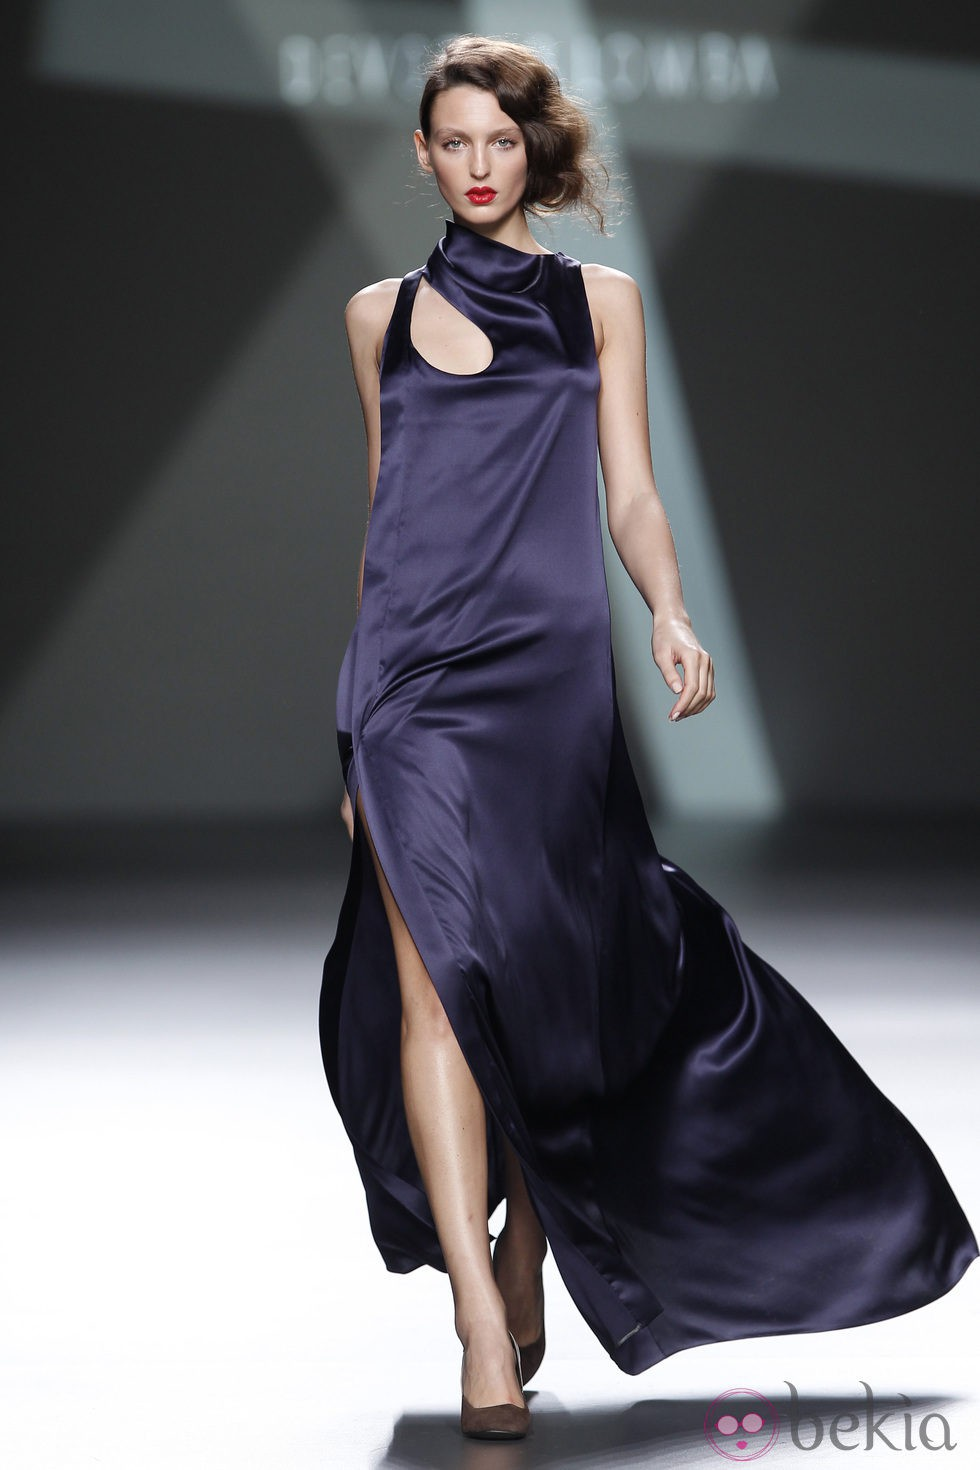 Desfile De Devota Y Lomba En La Fashion Week Madrid Vestido Largo En Tono Morado Colecci N